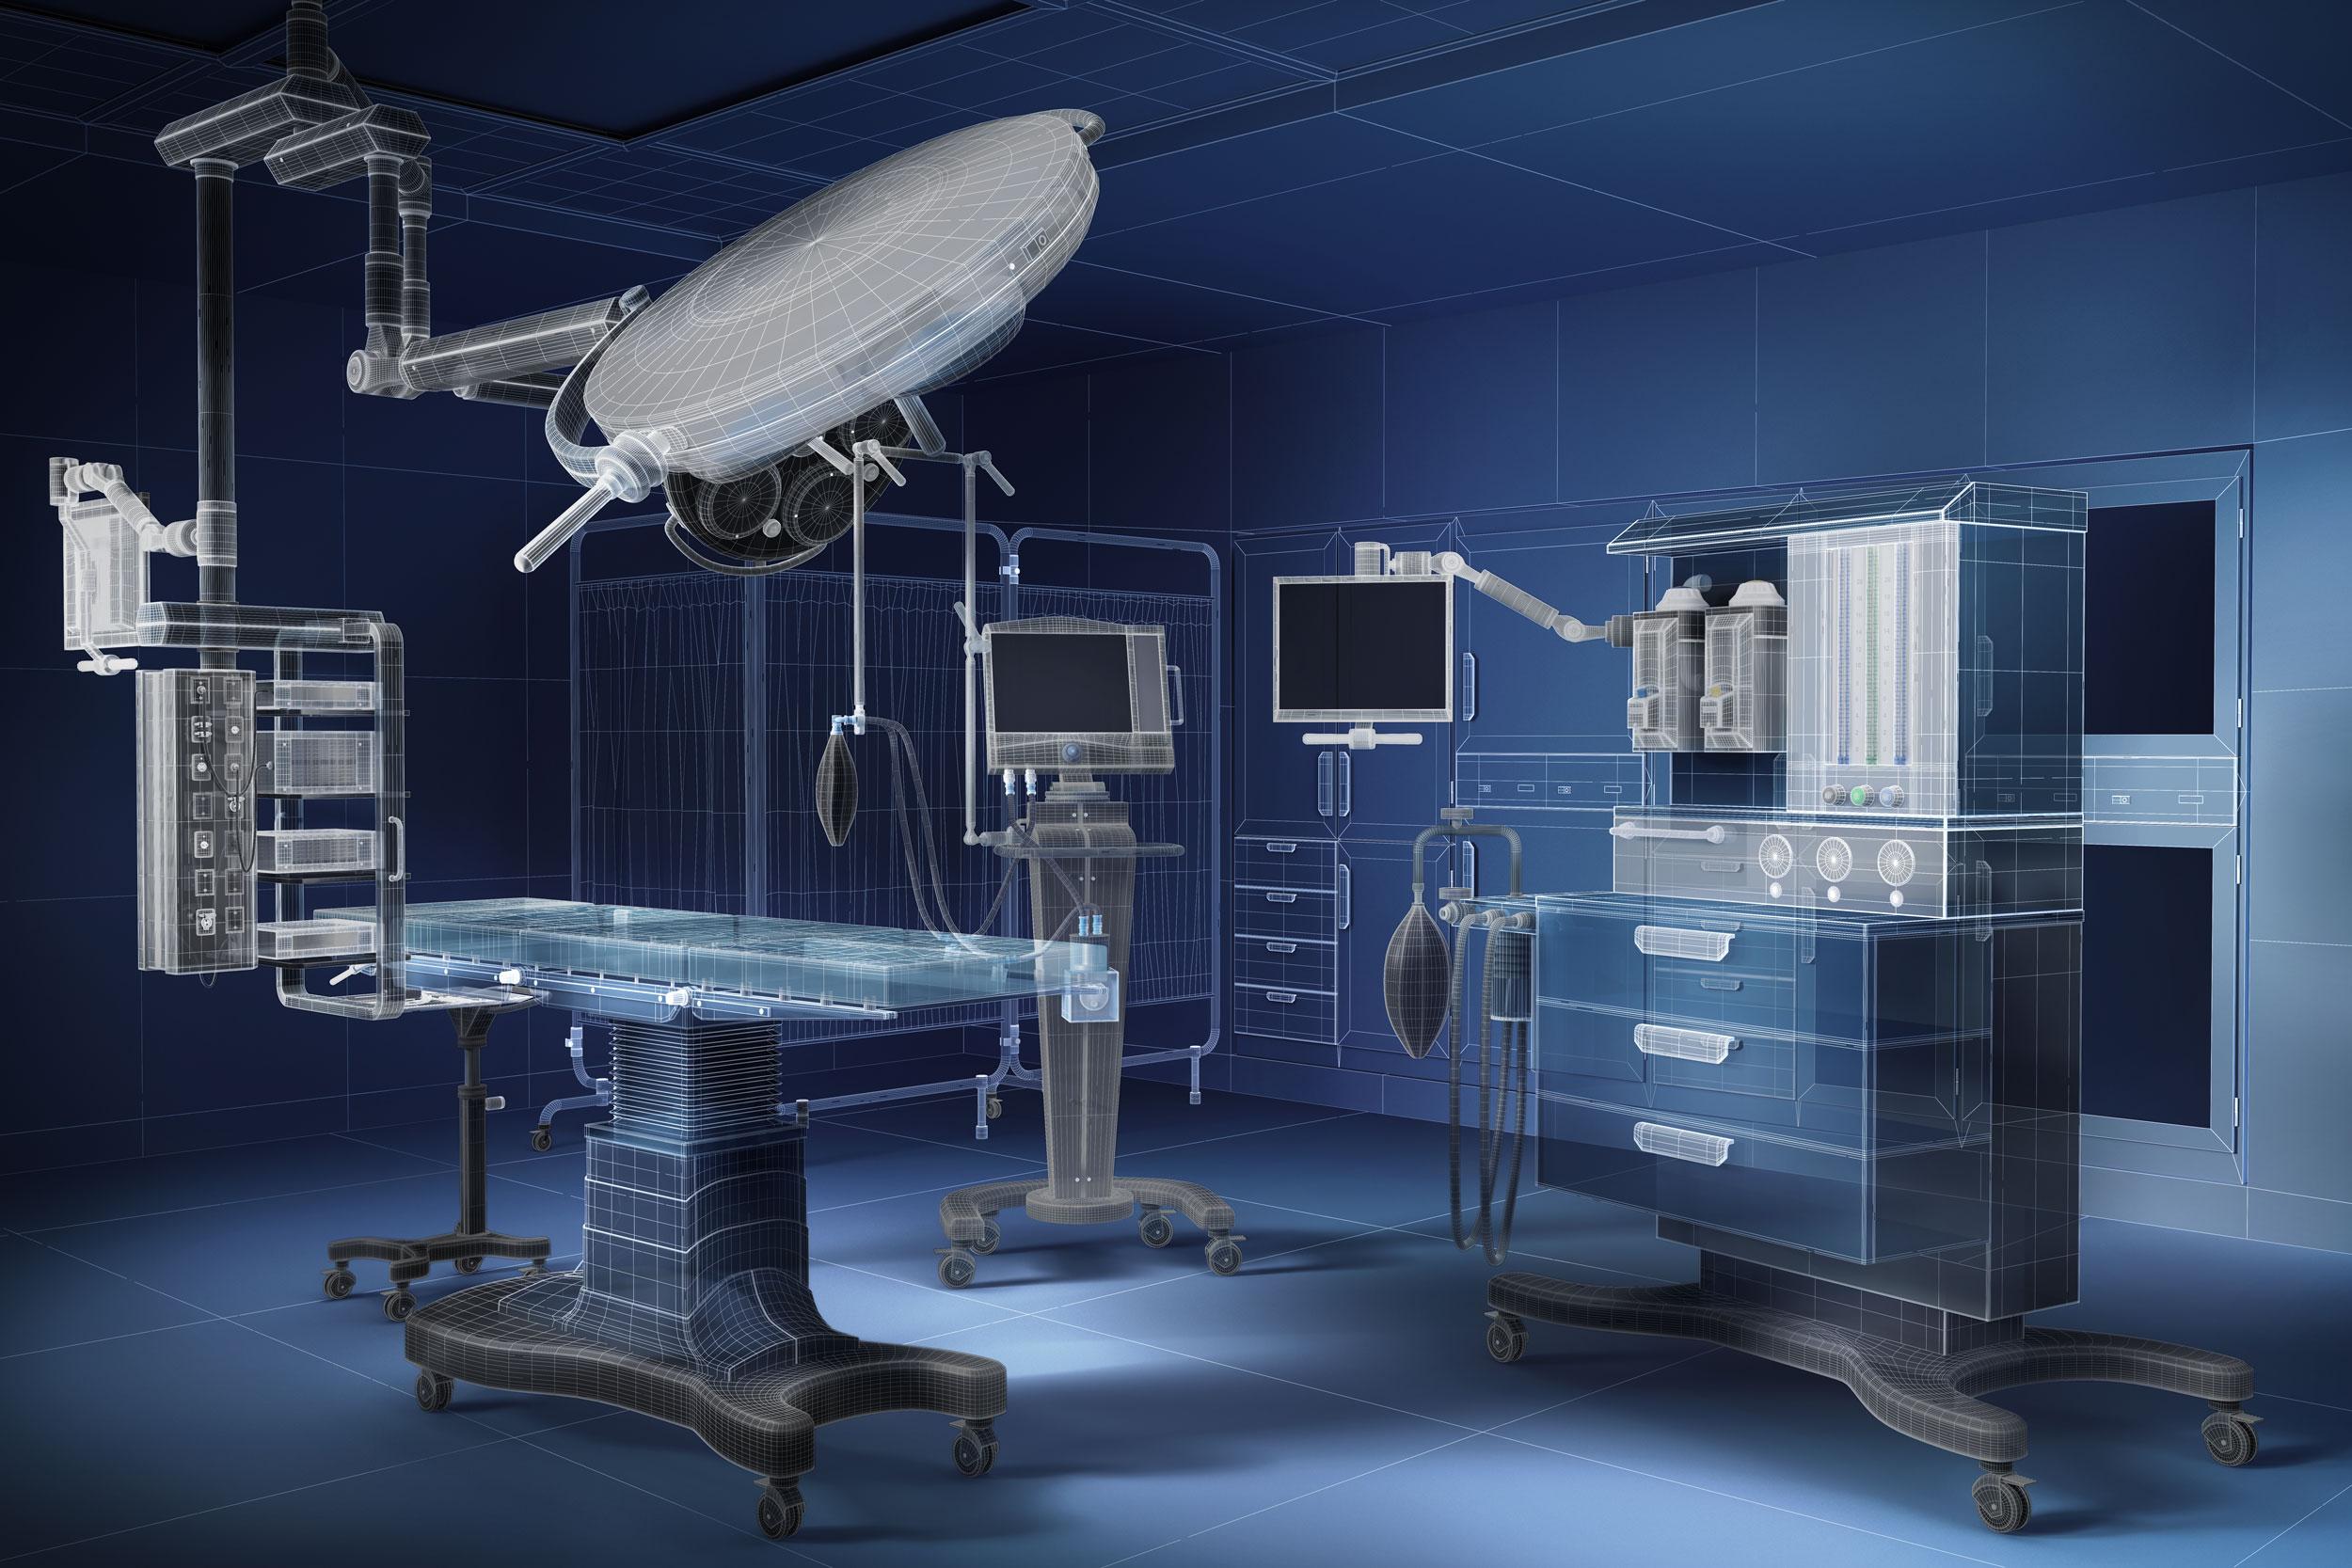 cgi blueprint imagery of operating room